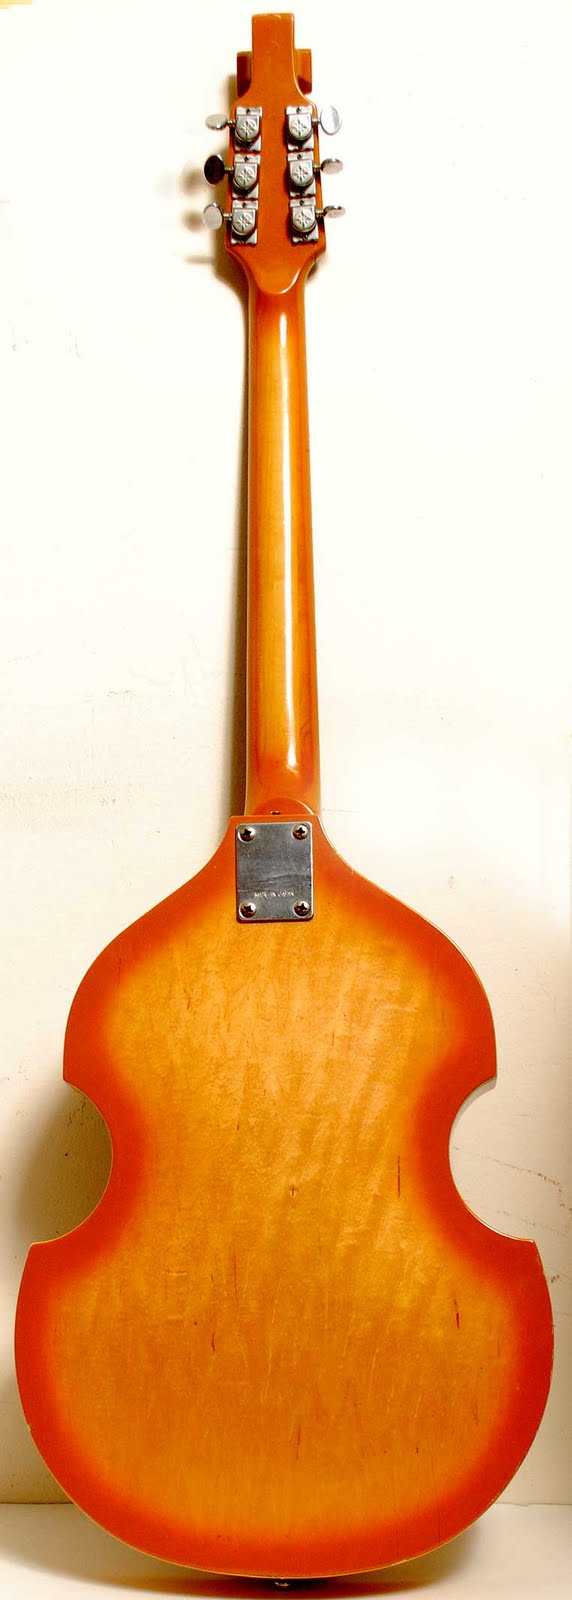 Craigslist Vintage Guitar Hunt April 2011 Norma Wiring Diagram Electric Violin Shape 250 North Side Date 04 11 914pm Cdt Reply To Sale Apbhg 2319774605craigslistorg Errors When